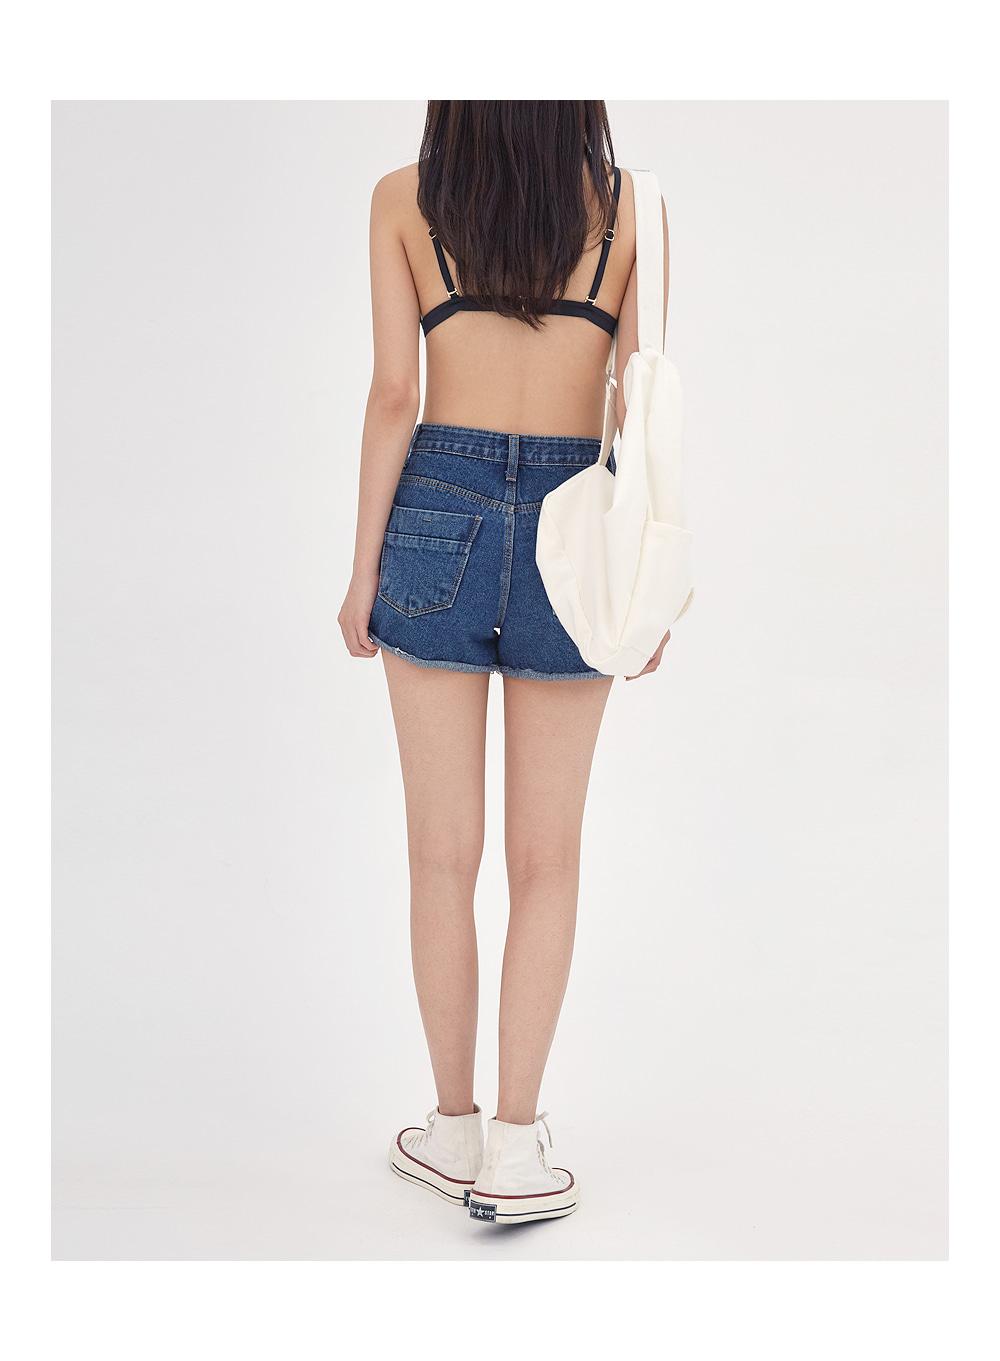 simple line bra top